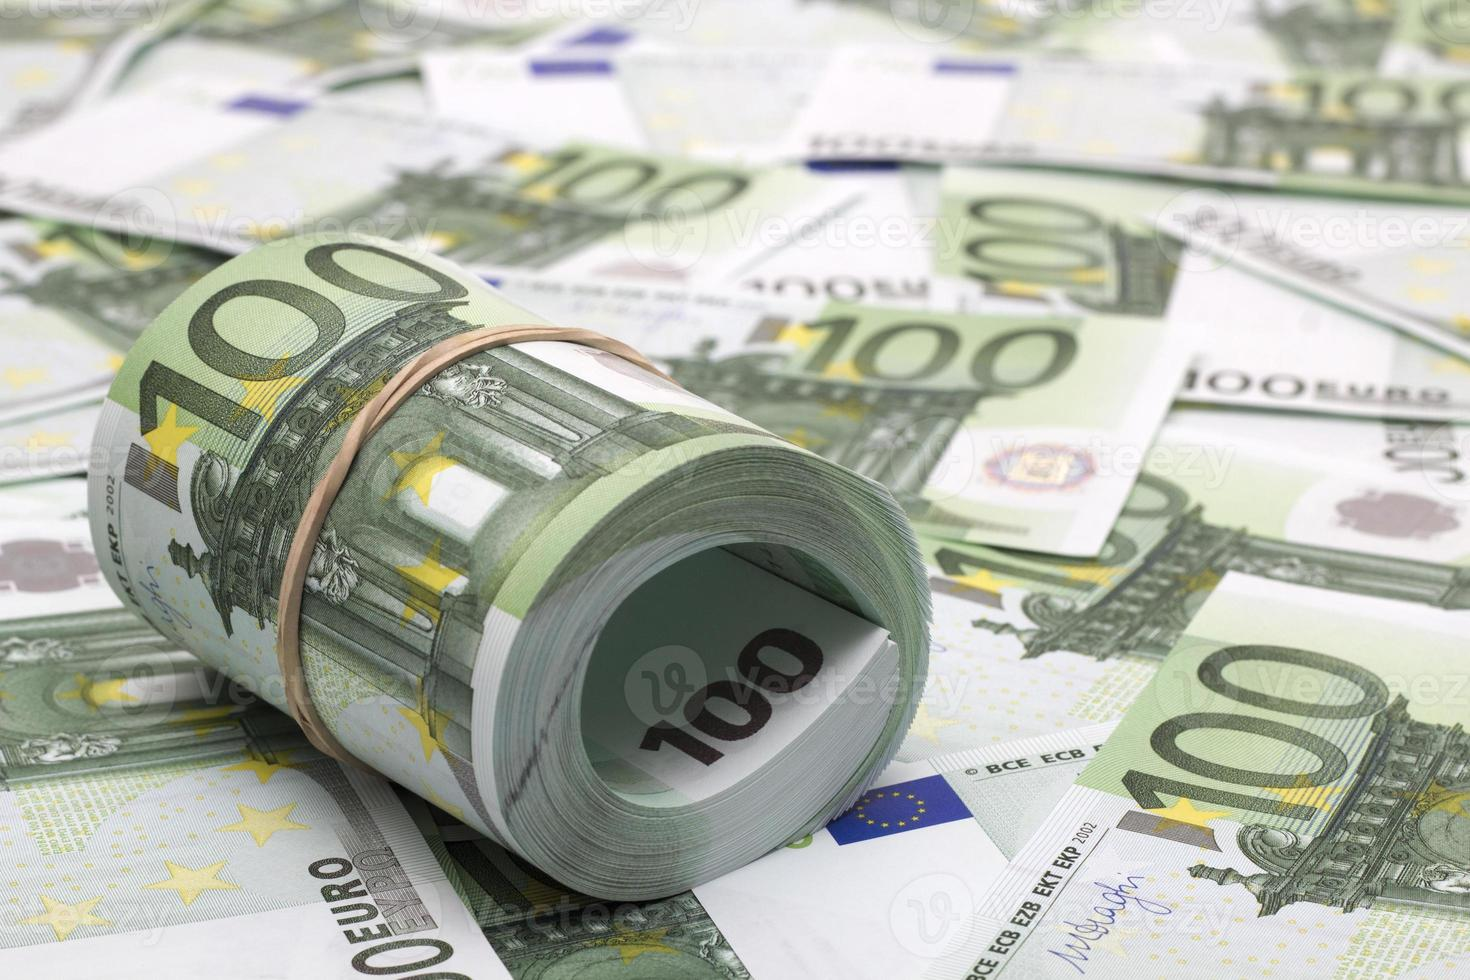 valuta, close-up foto